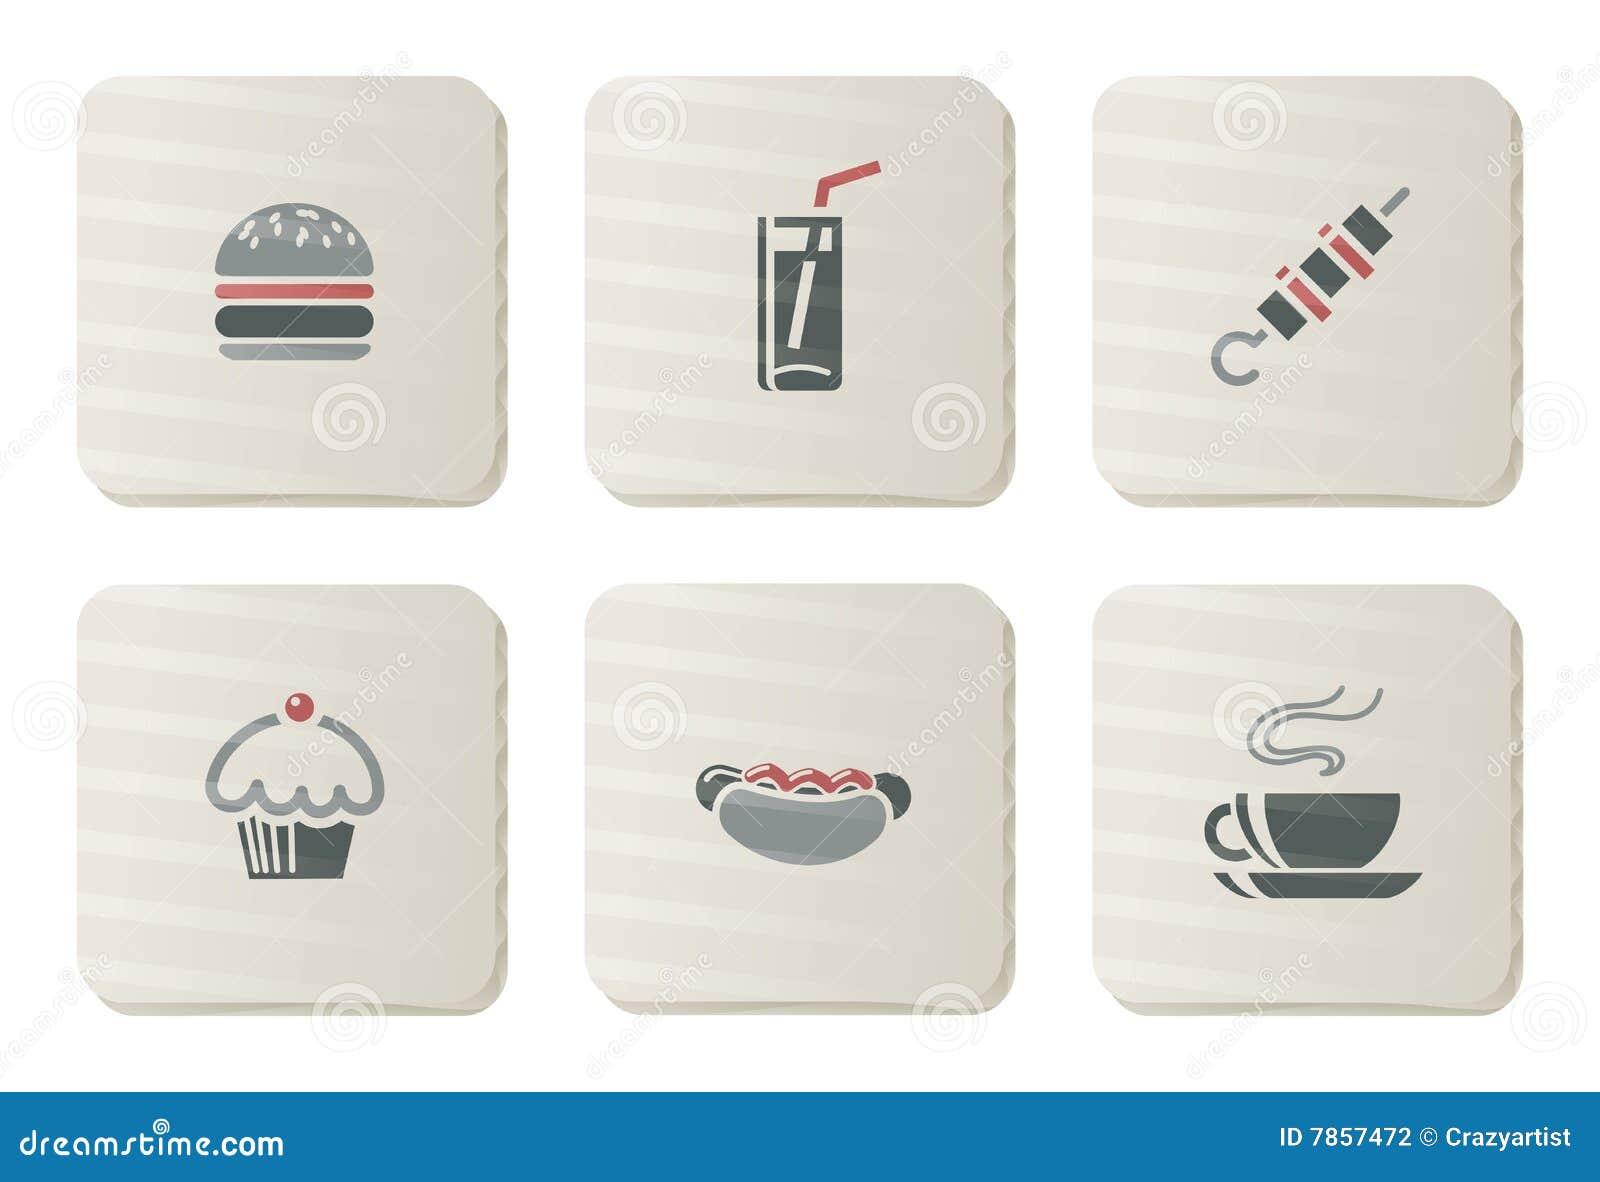 Fast food icons | Cardboard series